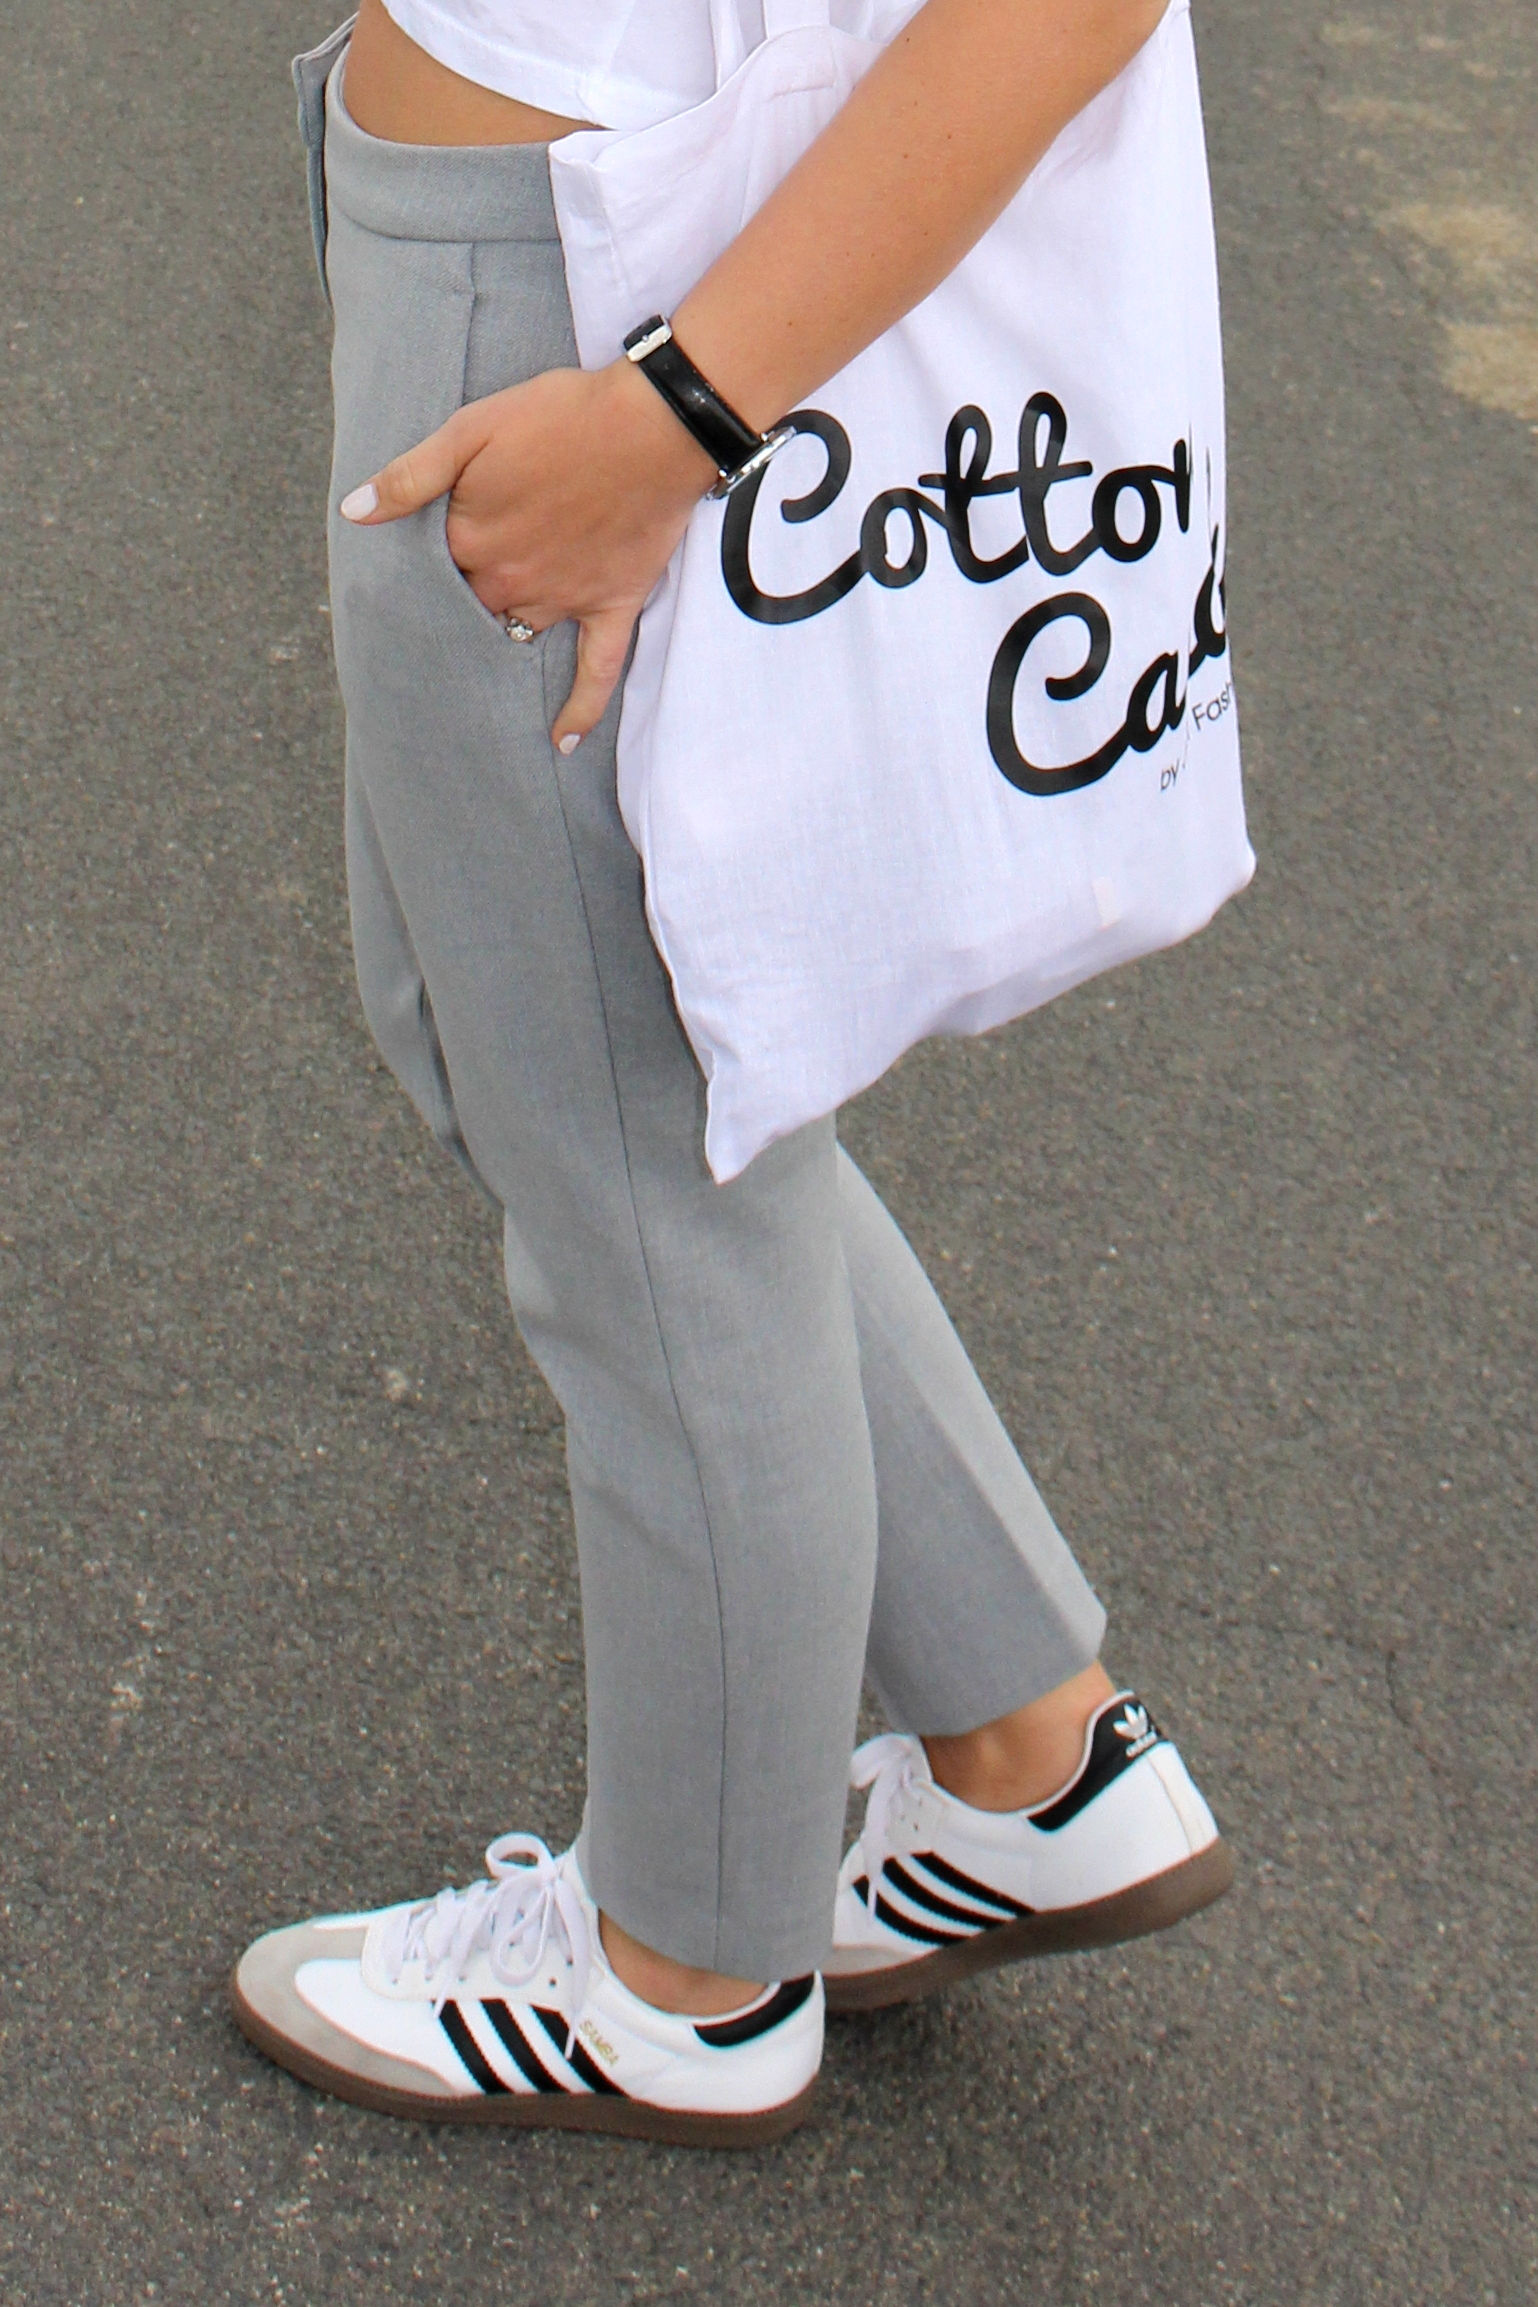 Fashioncircuz by Jenny img_6042 EIN GANZ NORMALER SAMSTAG